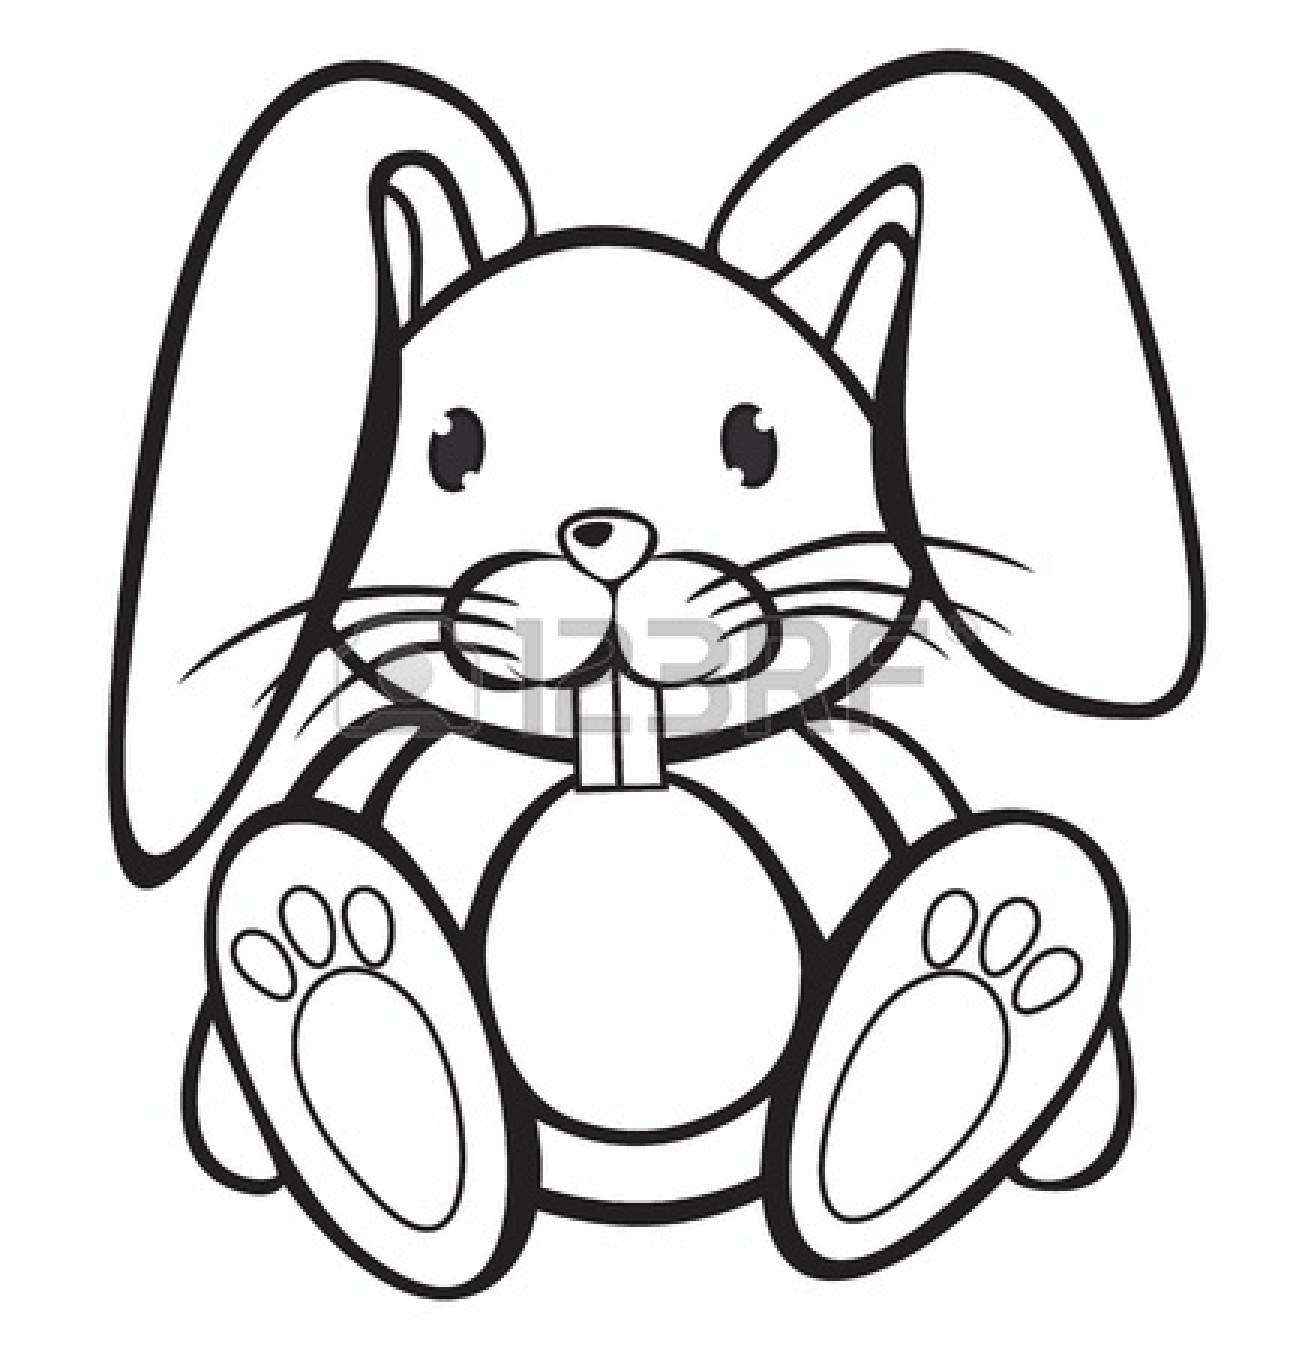 Rabbit Clipart Black And White-rabbit clipart black and white-11